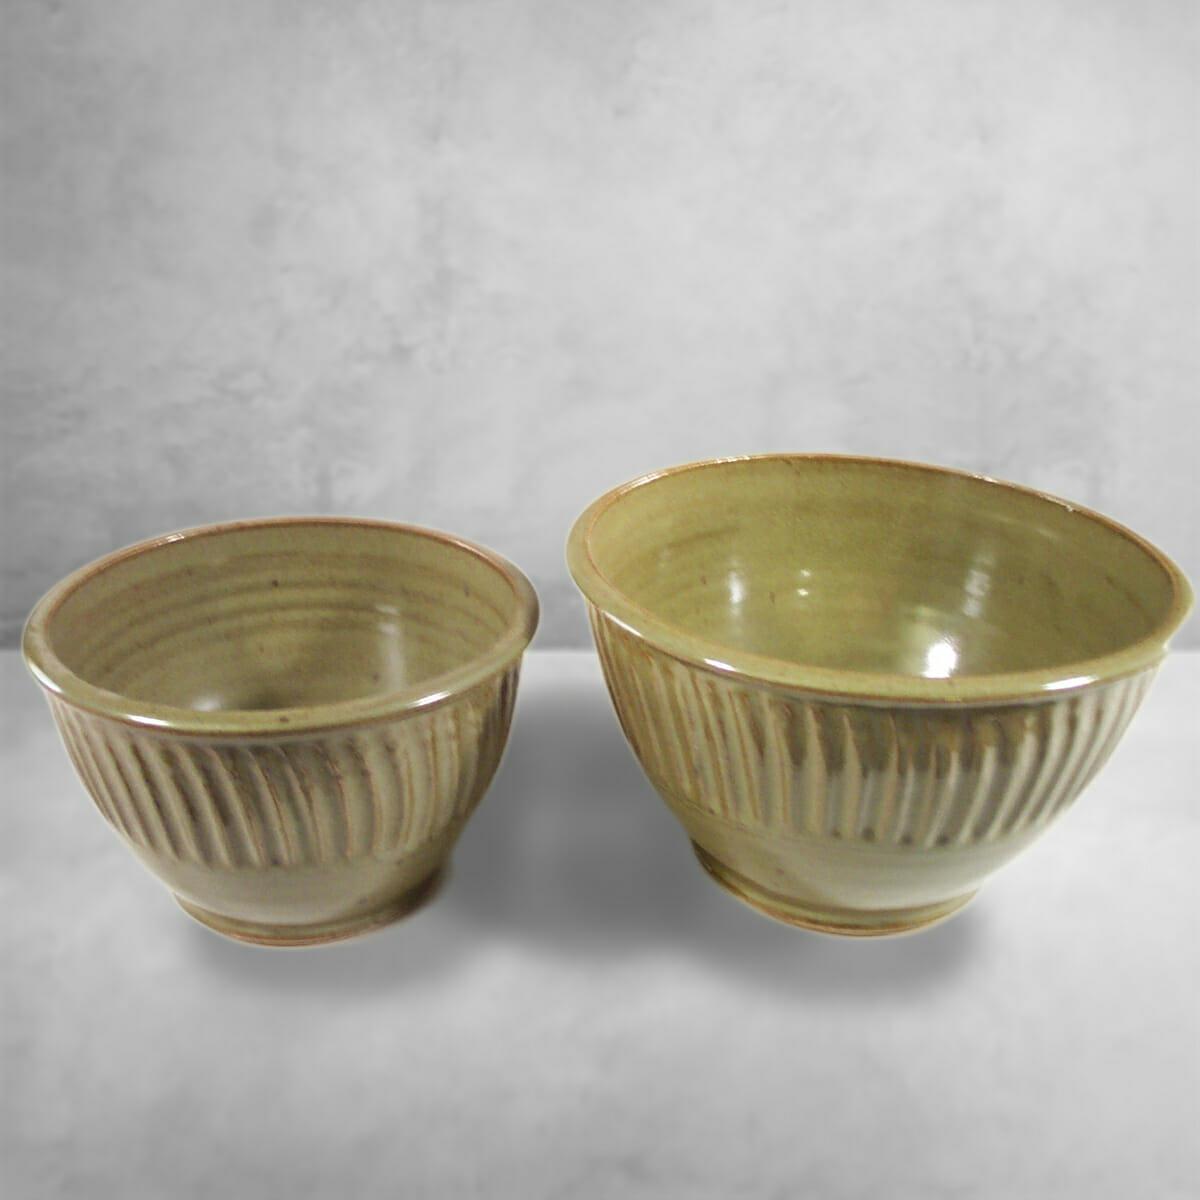 Small Deep Bowl or Medium Deep Bowl Fluted Design in Green Glaze